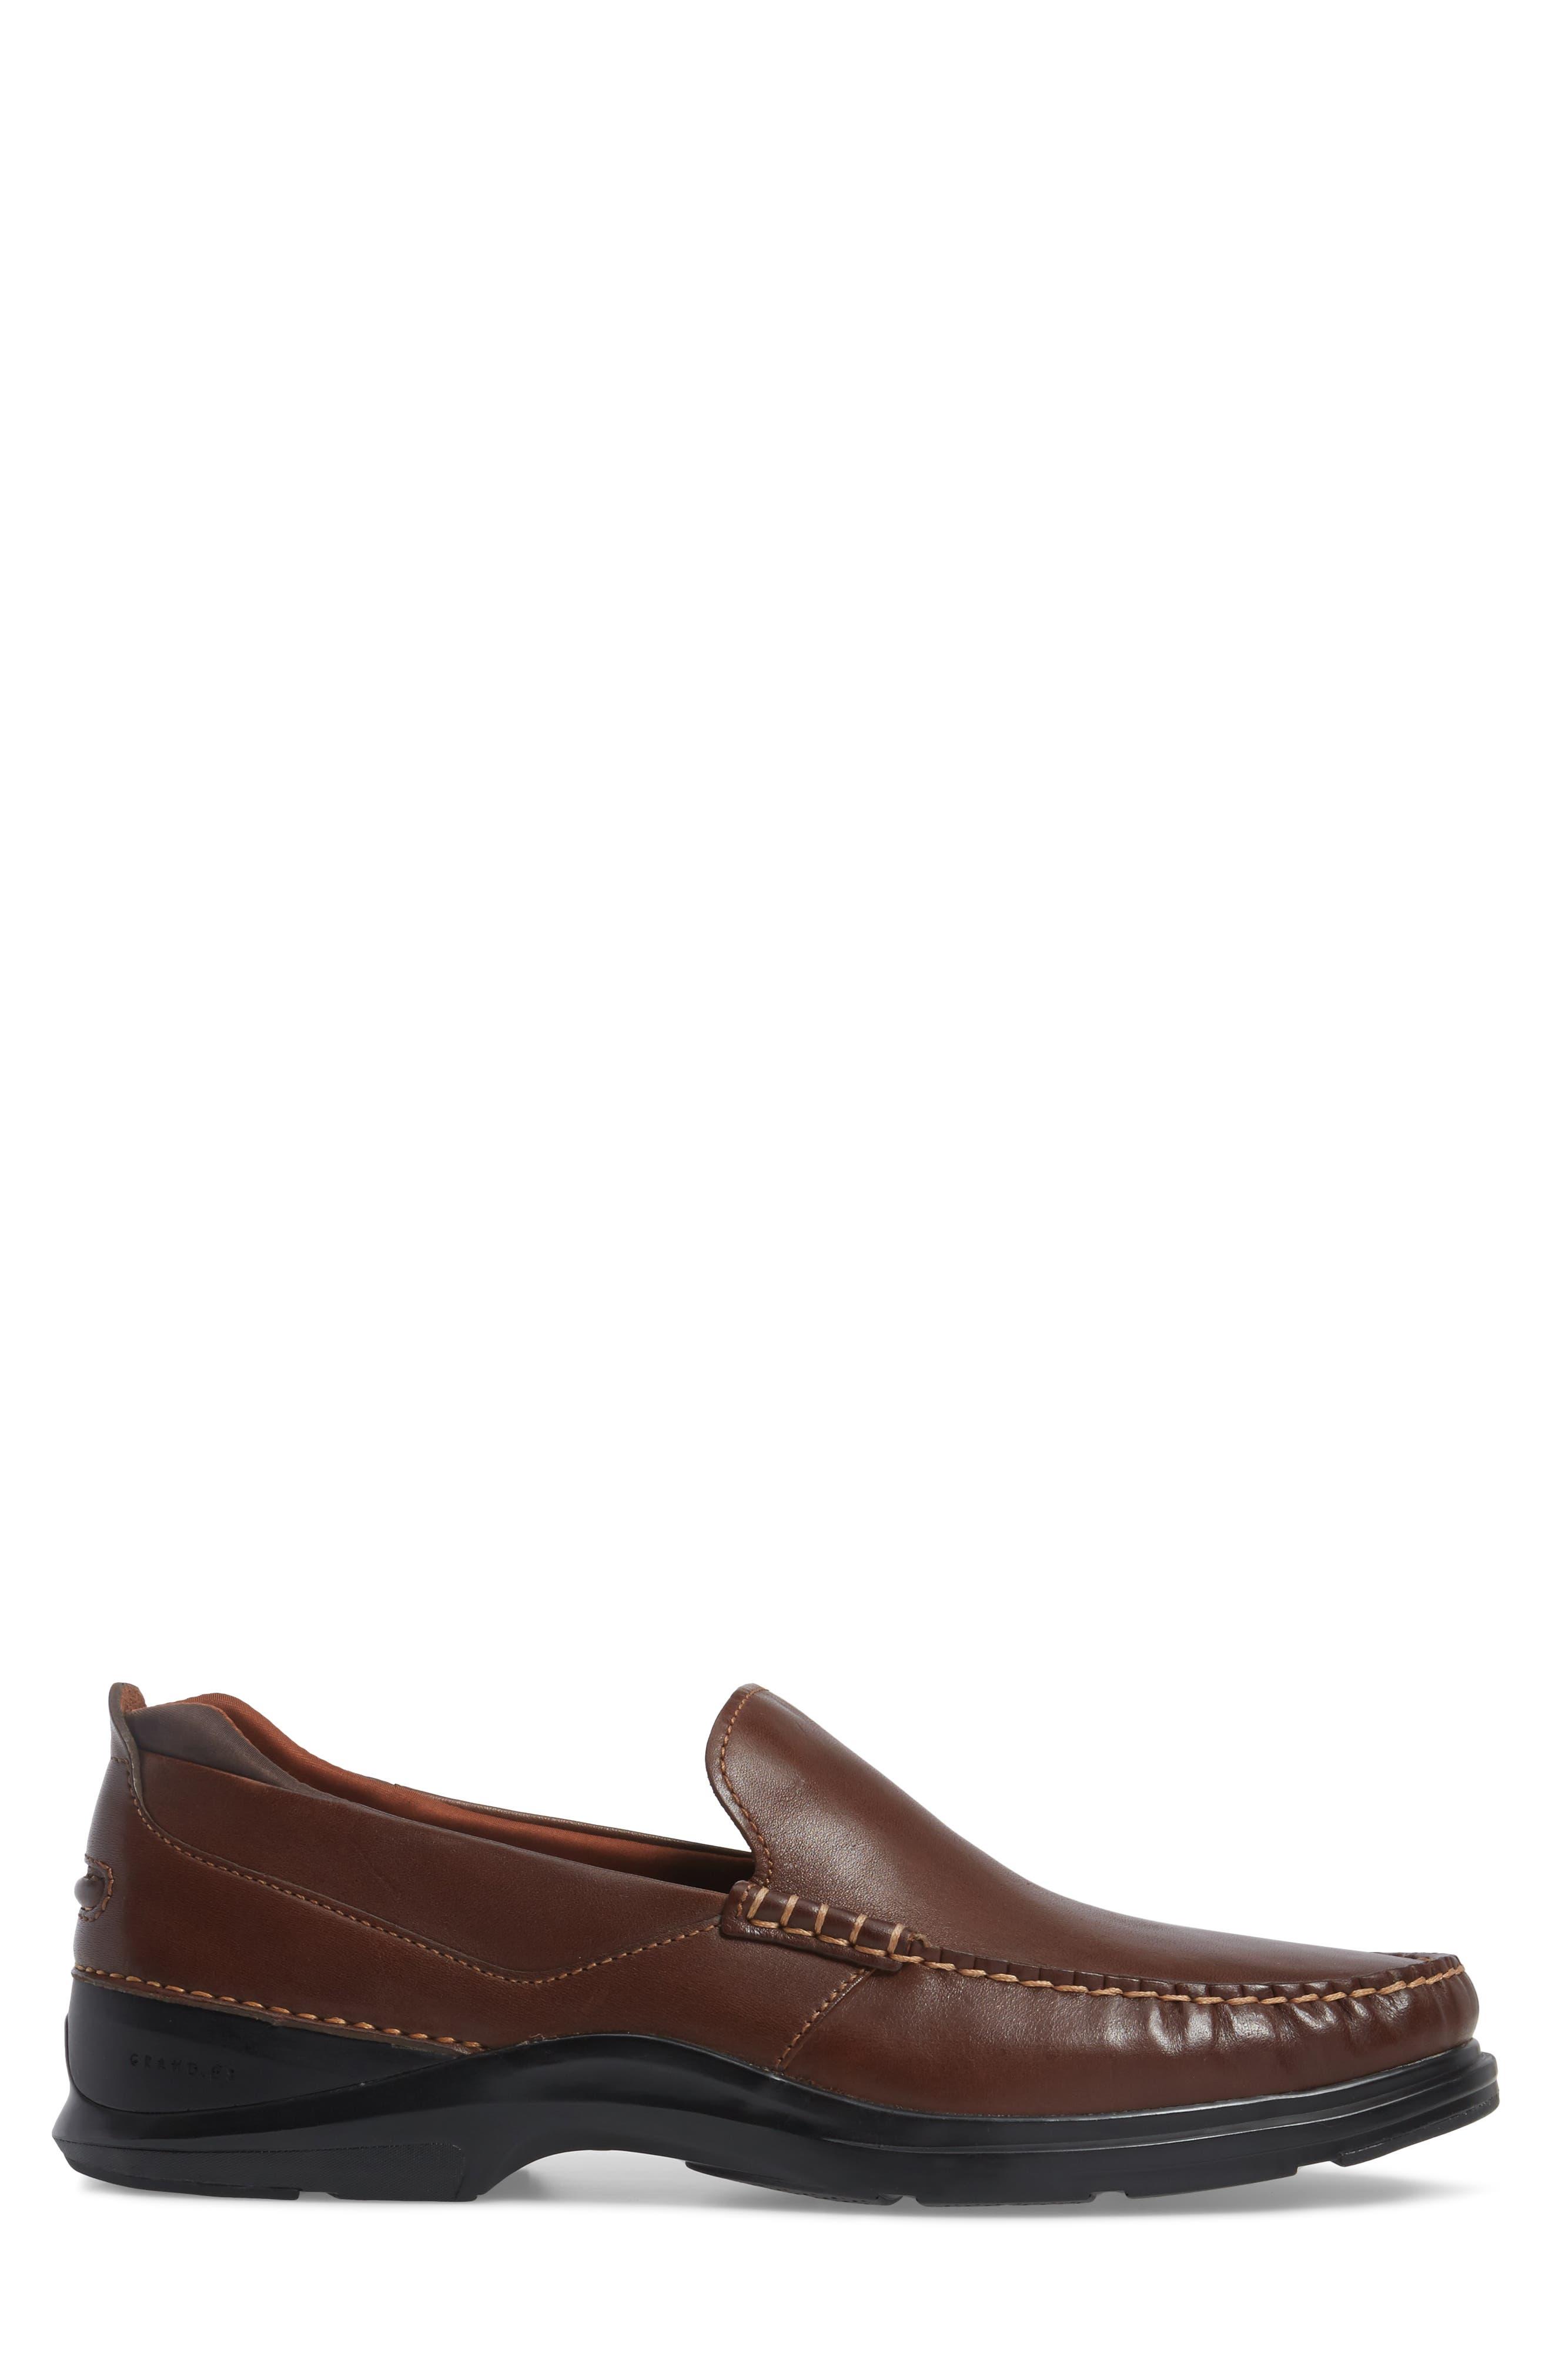 Bancroft Loafer,                             Alternate thumbnail 3, color,                             Harvest Brown Leather